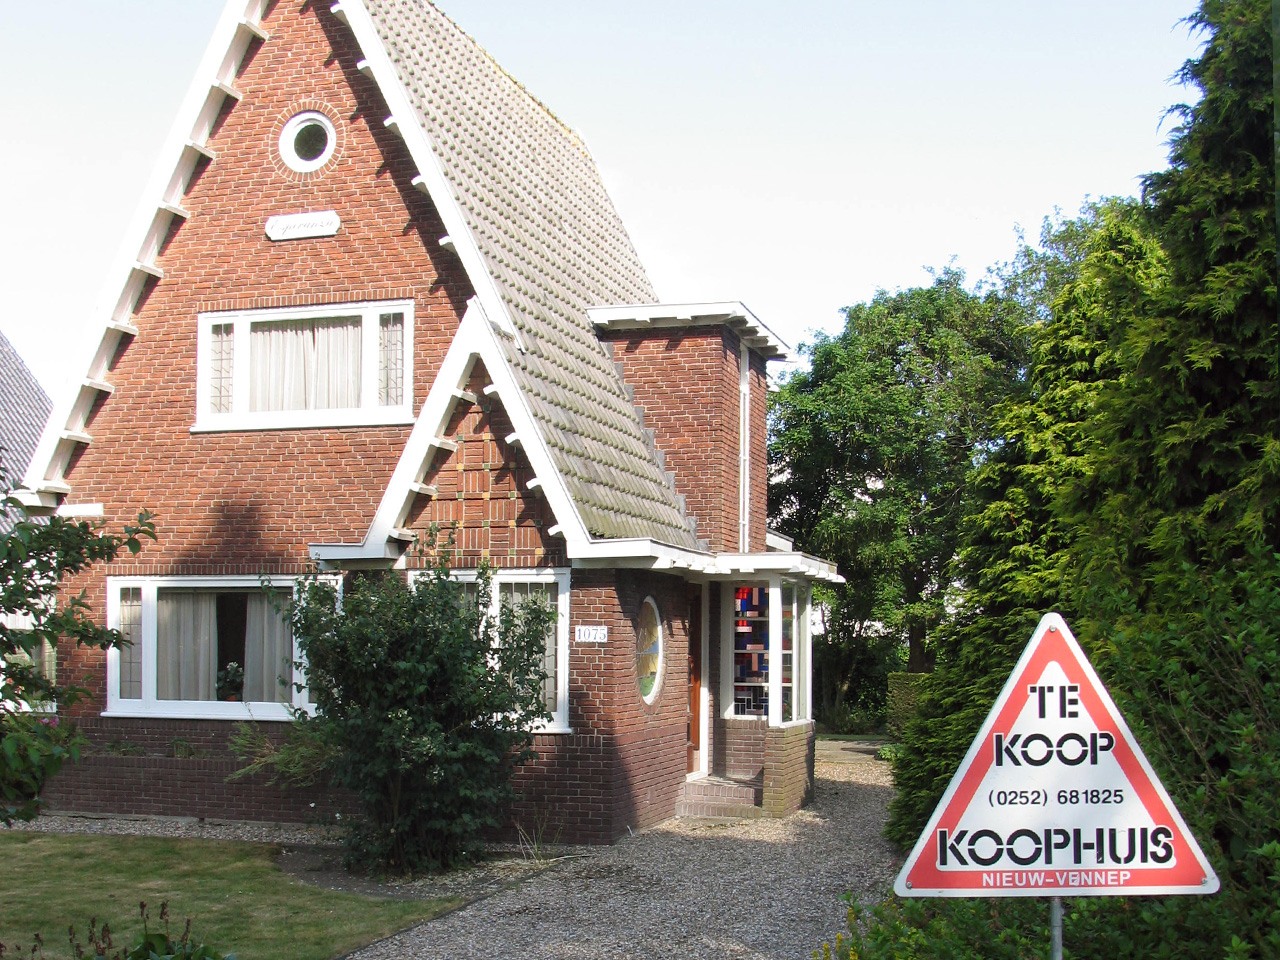 Afbeelding 3 / 8 - Nieuw-Vennep - Hoofdweg 1075 - Particuliere woning